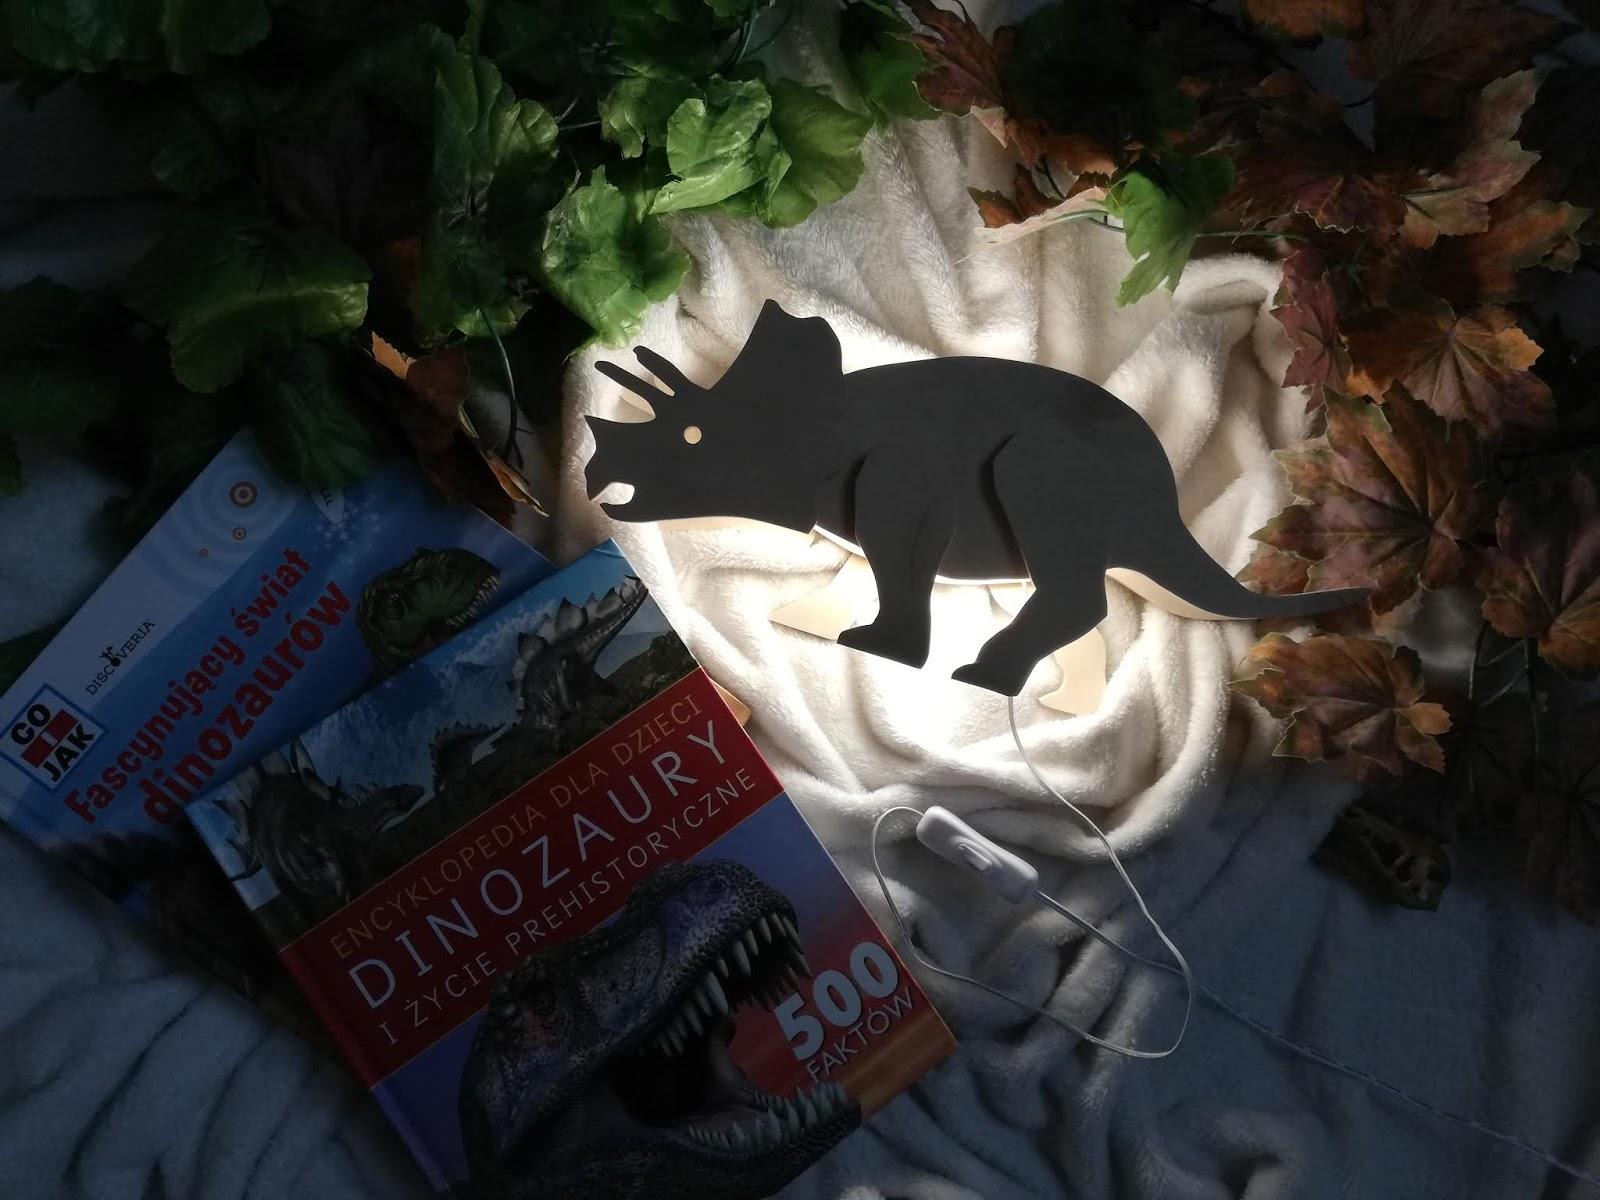 TILO i nocna lampka w kształcie triceratopsa